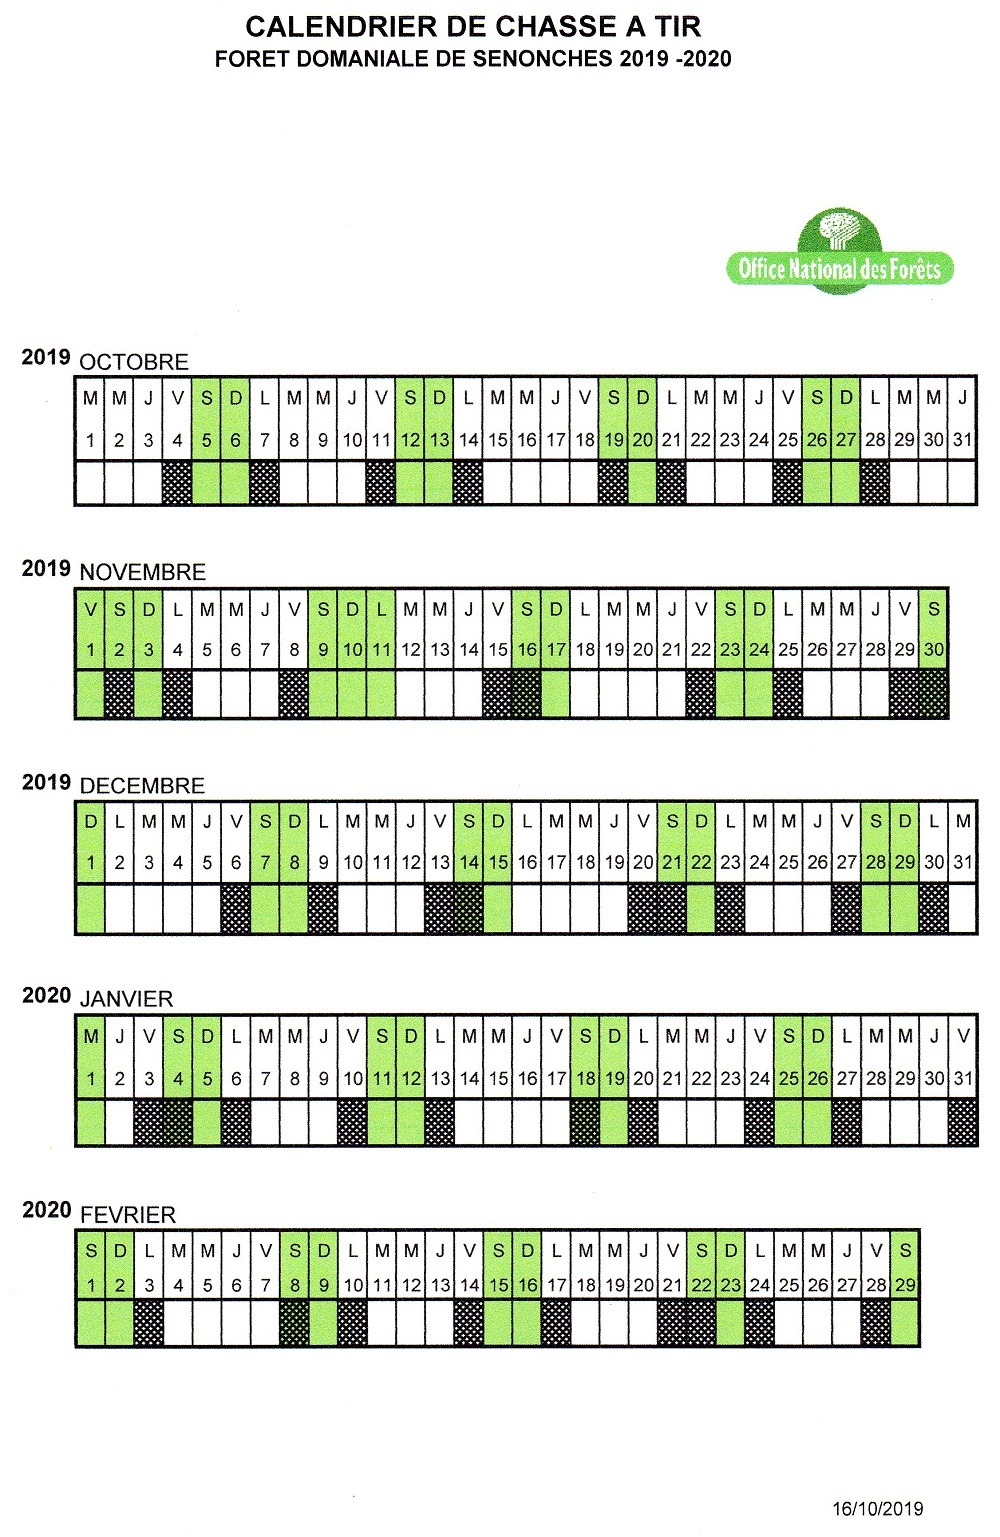 Calendrier 2019 2020 de chasse à tir à SENONCHES © ONF